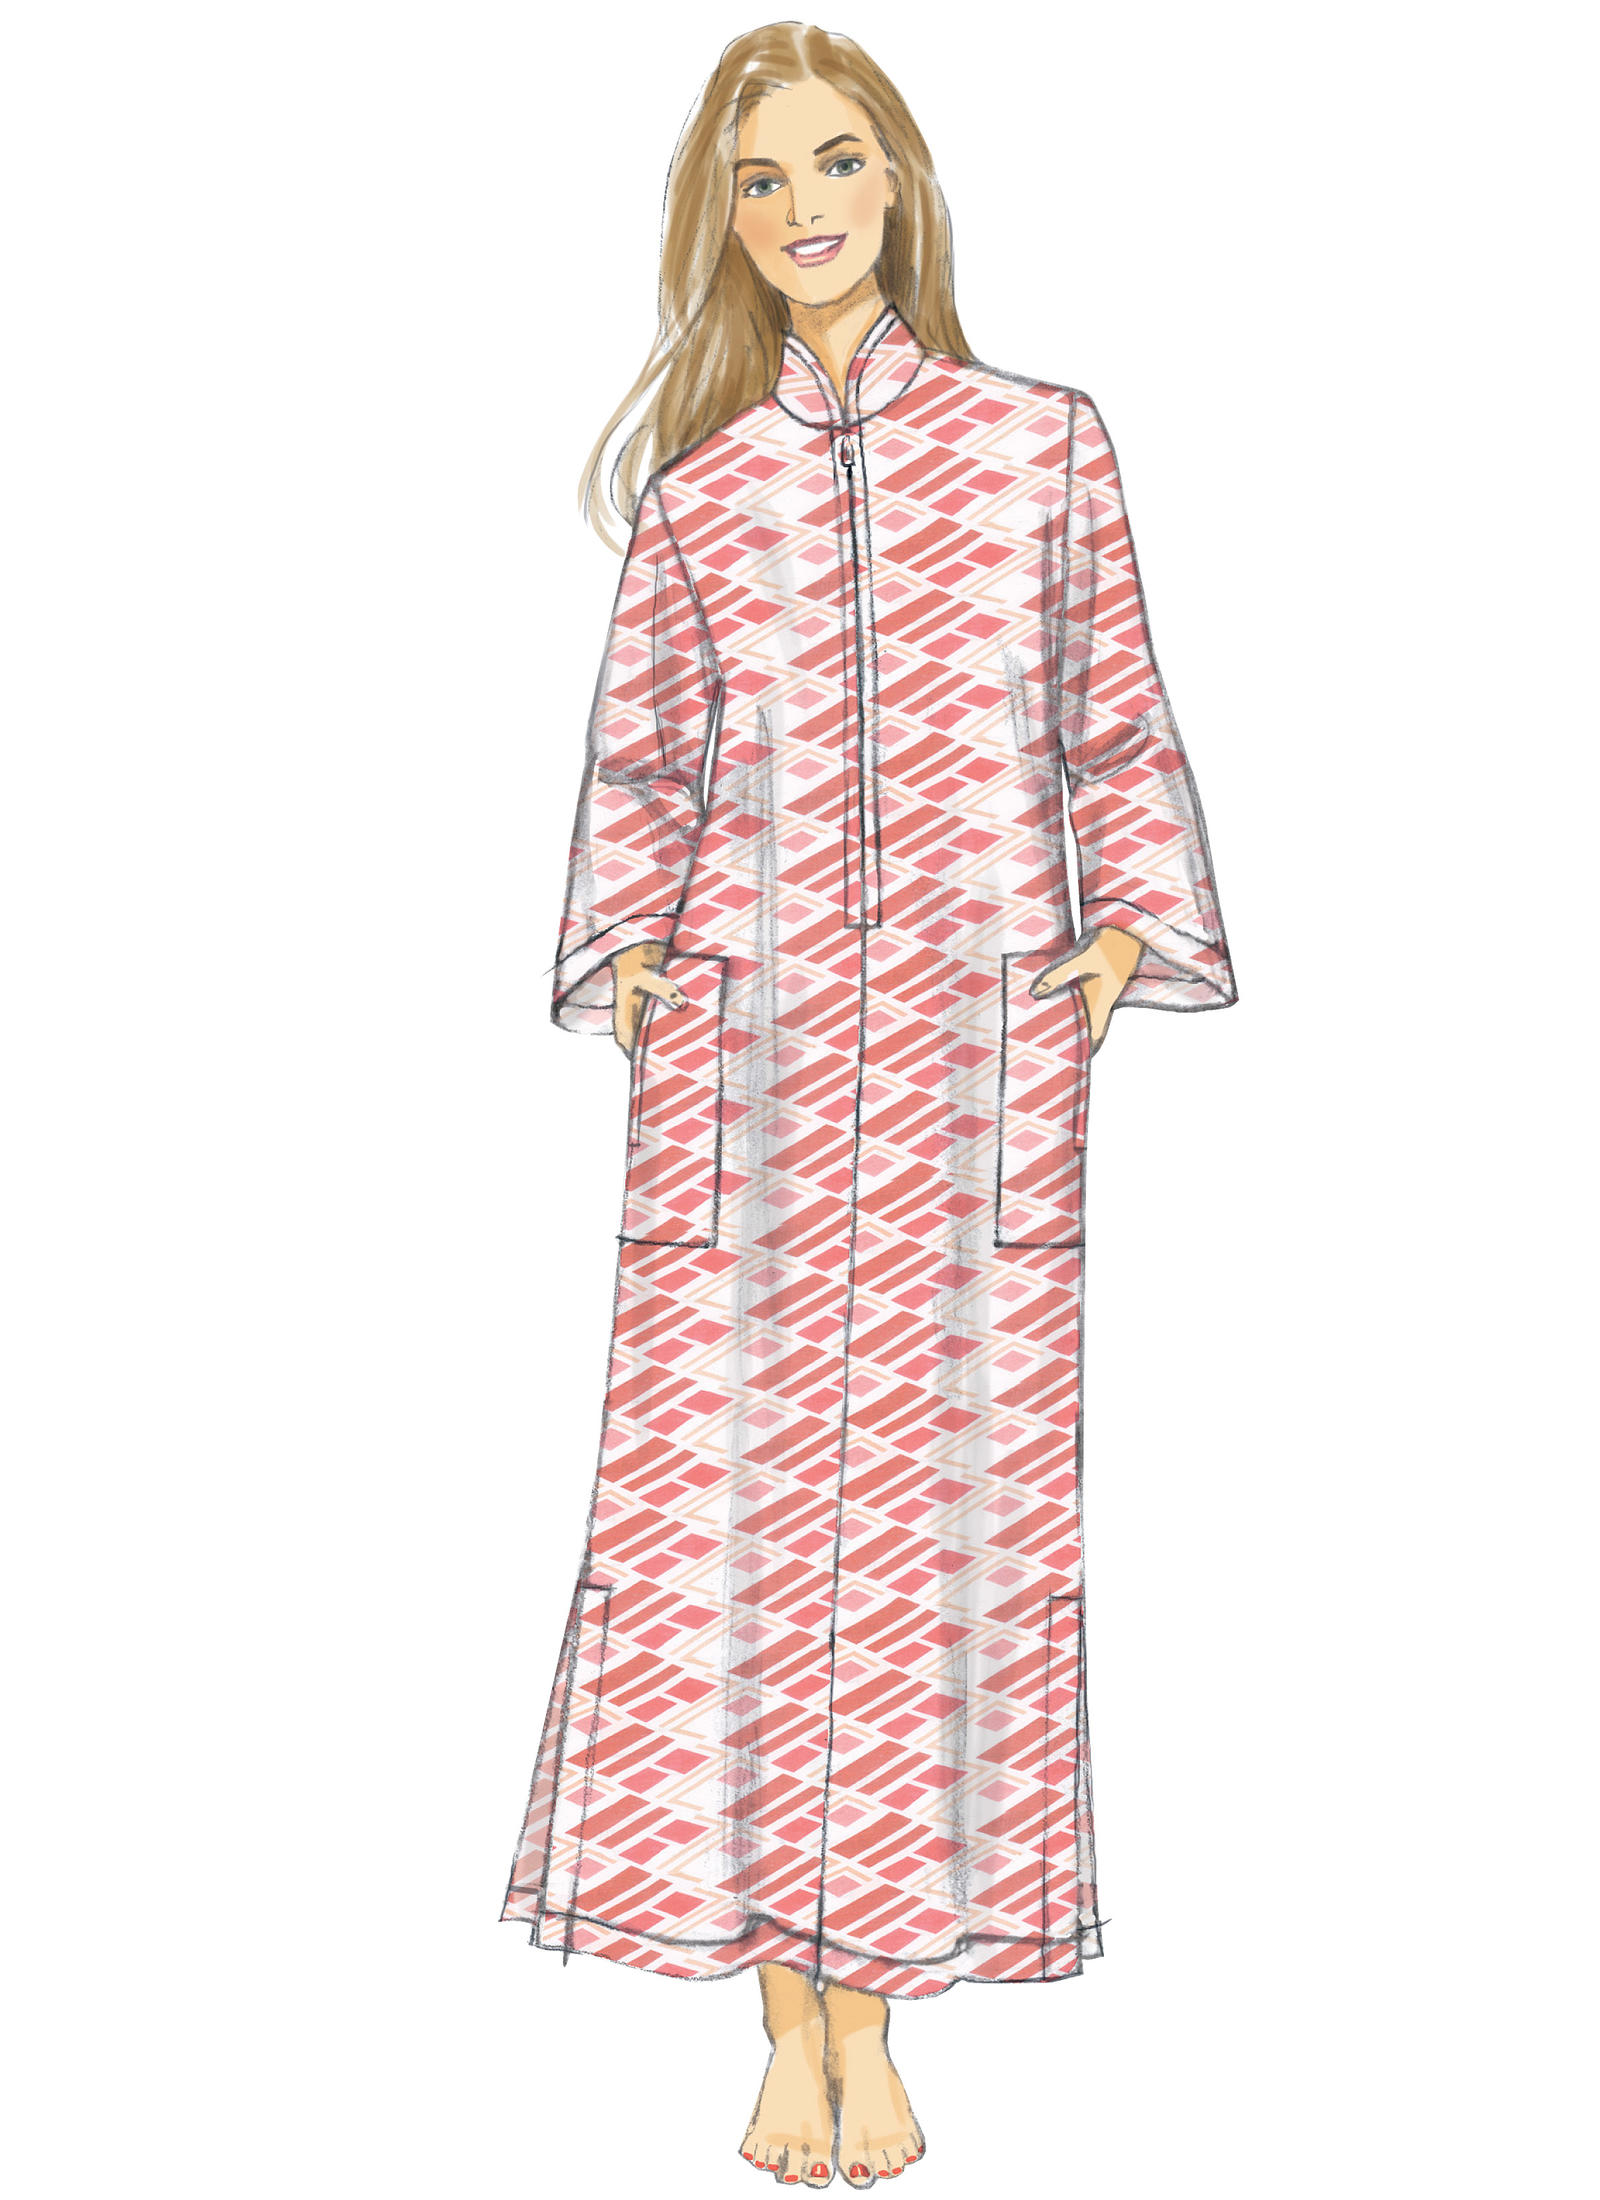 Vogue Patterns 9232 MISSES' ZIP-FRONT, DOLMAN SLEEVE CAFTANS